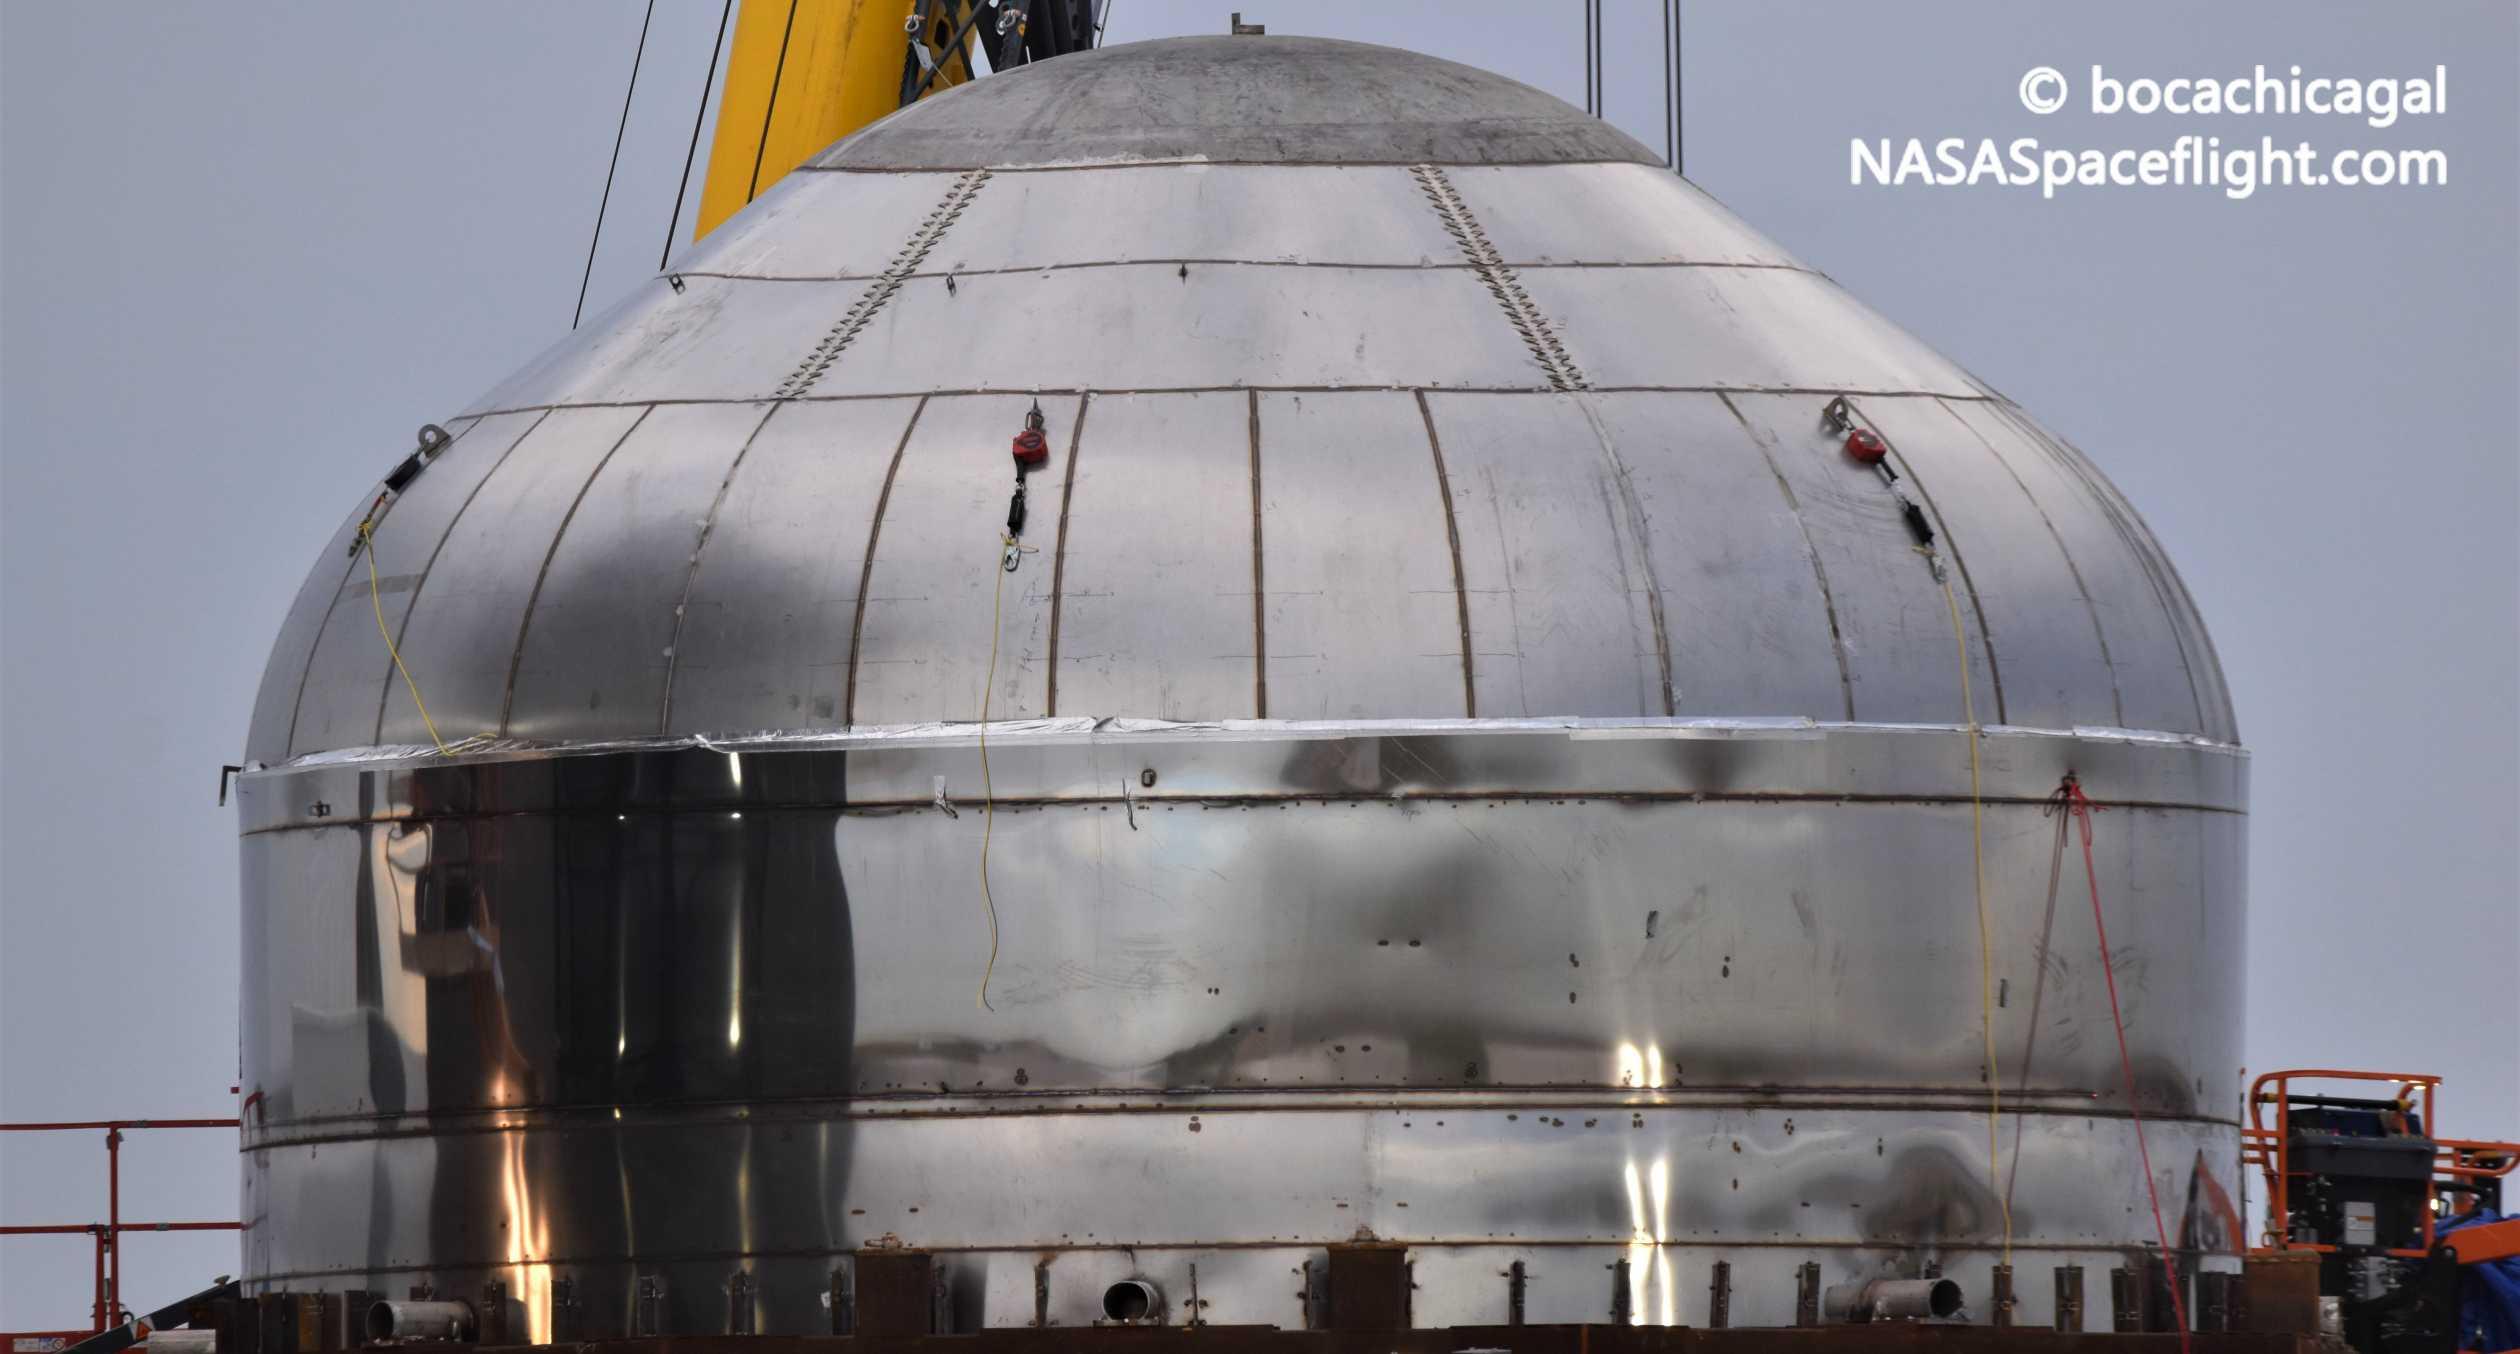 Starship Boca Chica 010920 (NASASpaceflight – bocachicagal) test tank 2 crop 1 (c)